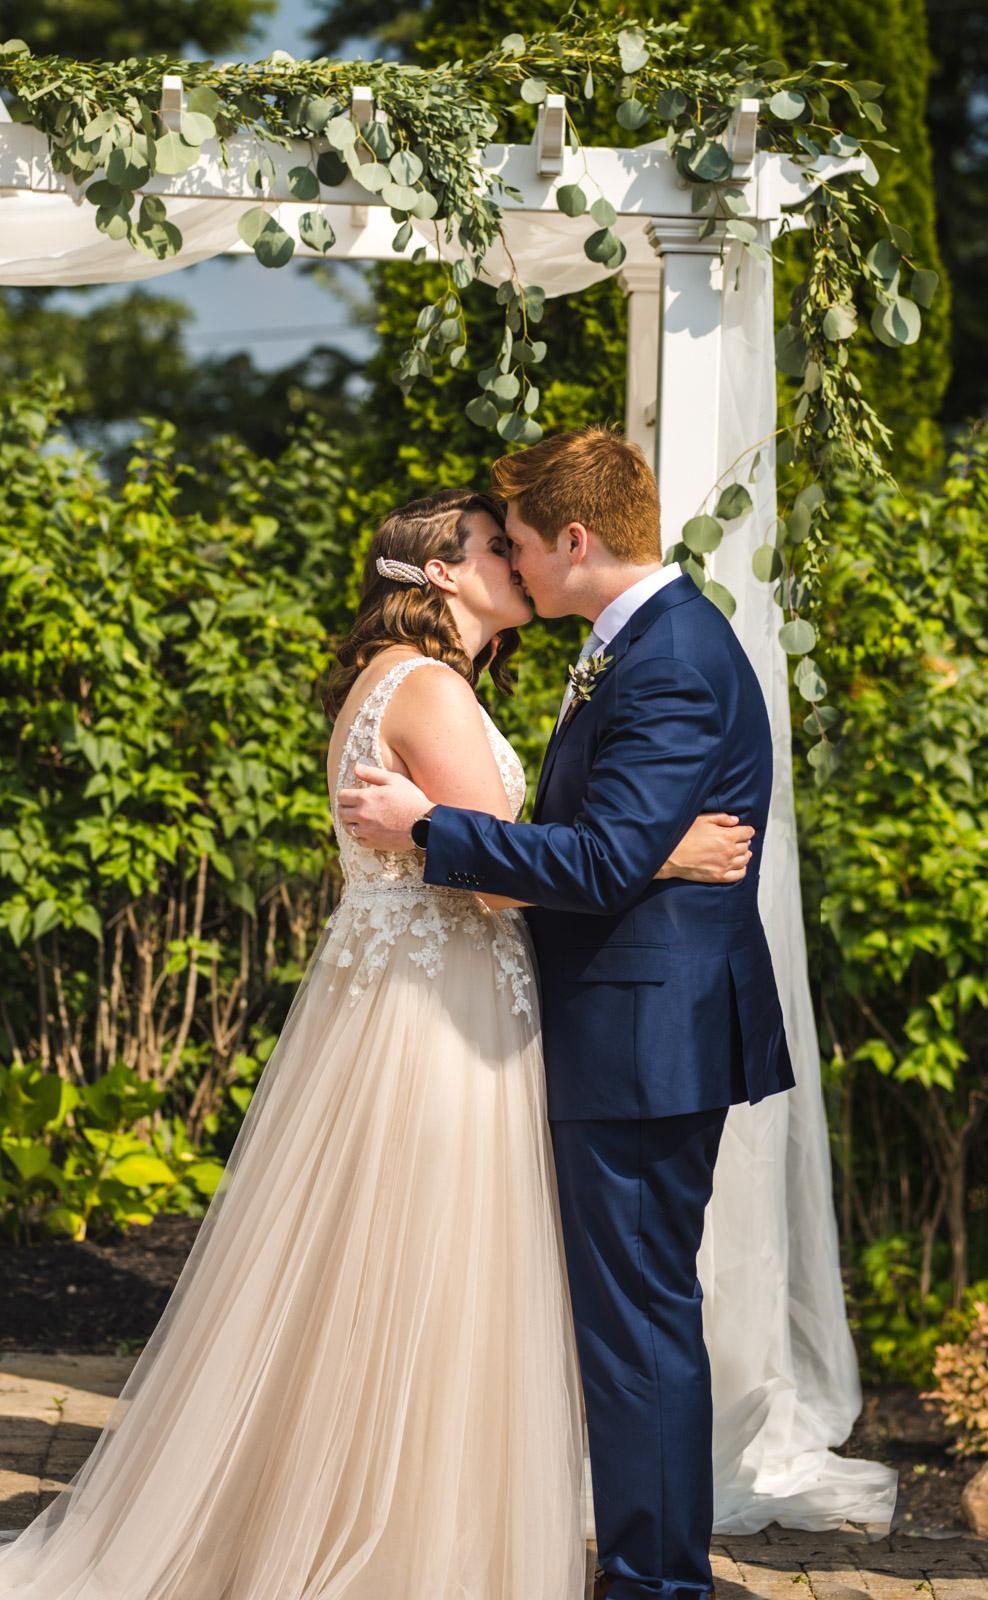 Emerson & Elicia's Golf Course Wedding Aidan & Leanne Hennebry Hamilton Wedding Videographers Photographers Niagara Hush Hush Photography & Film-25.jpg